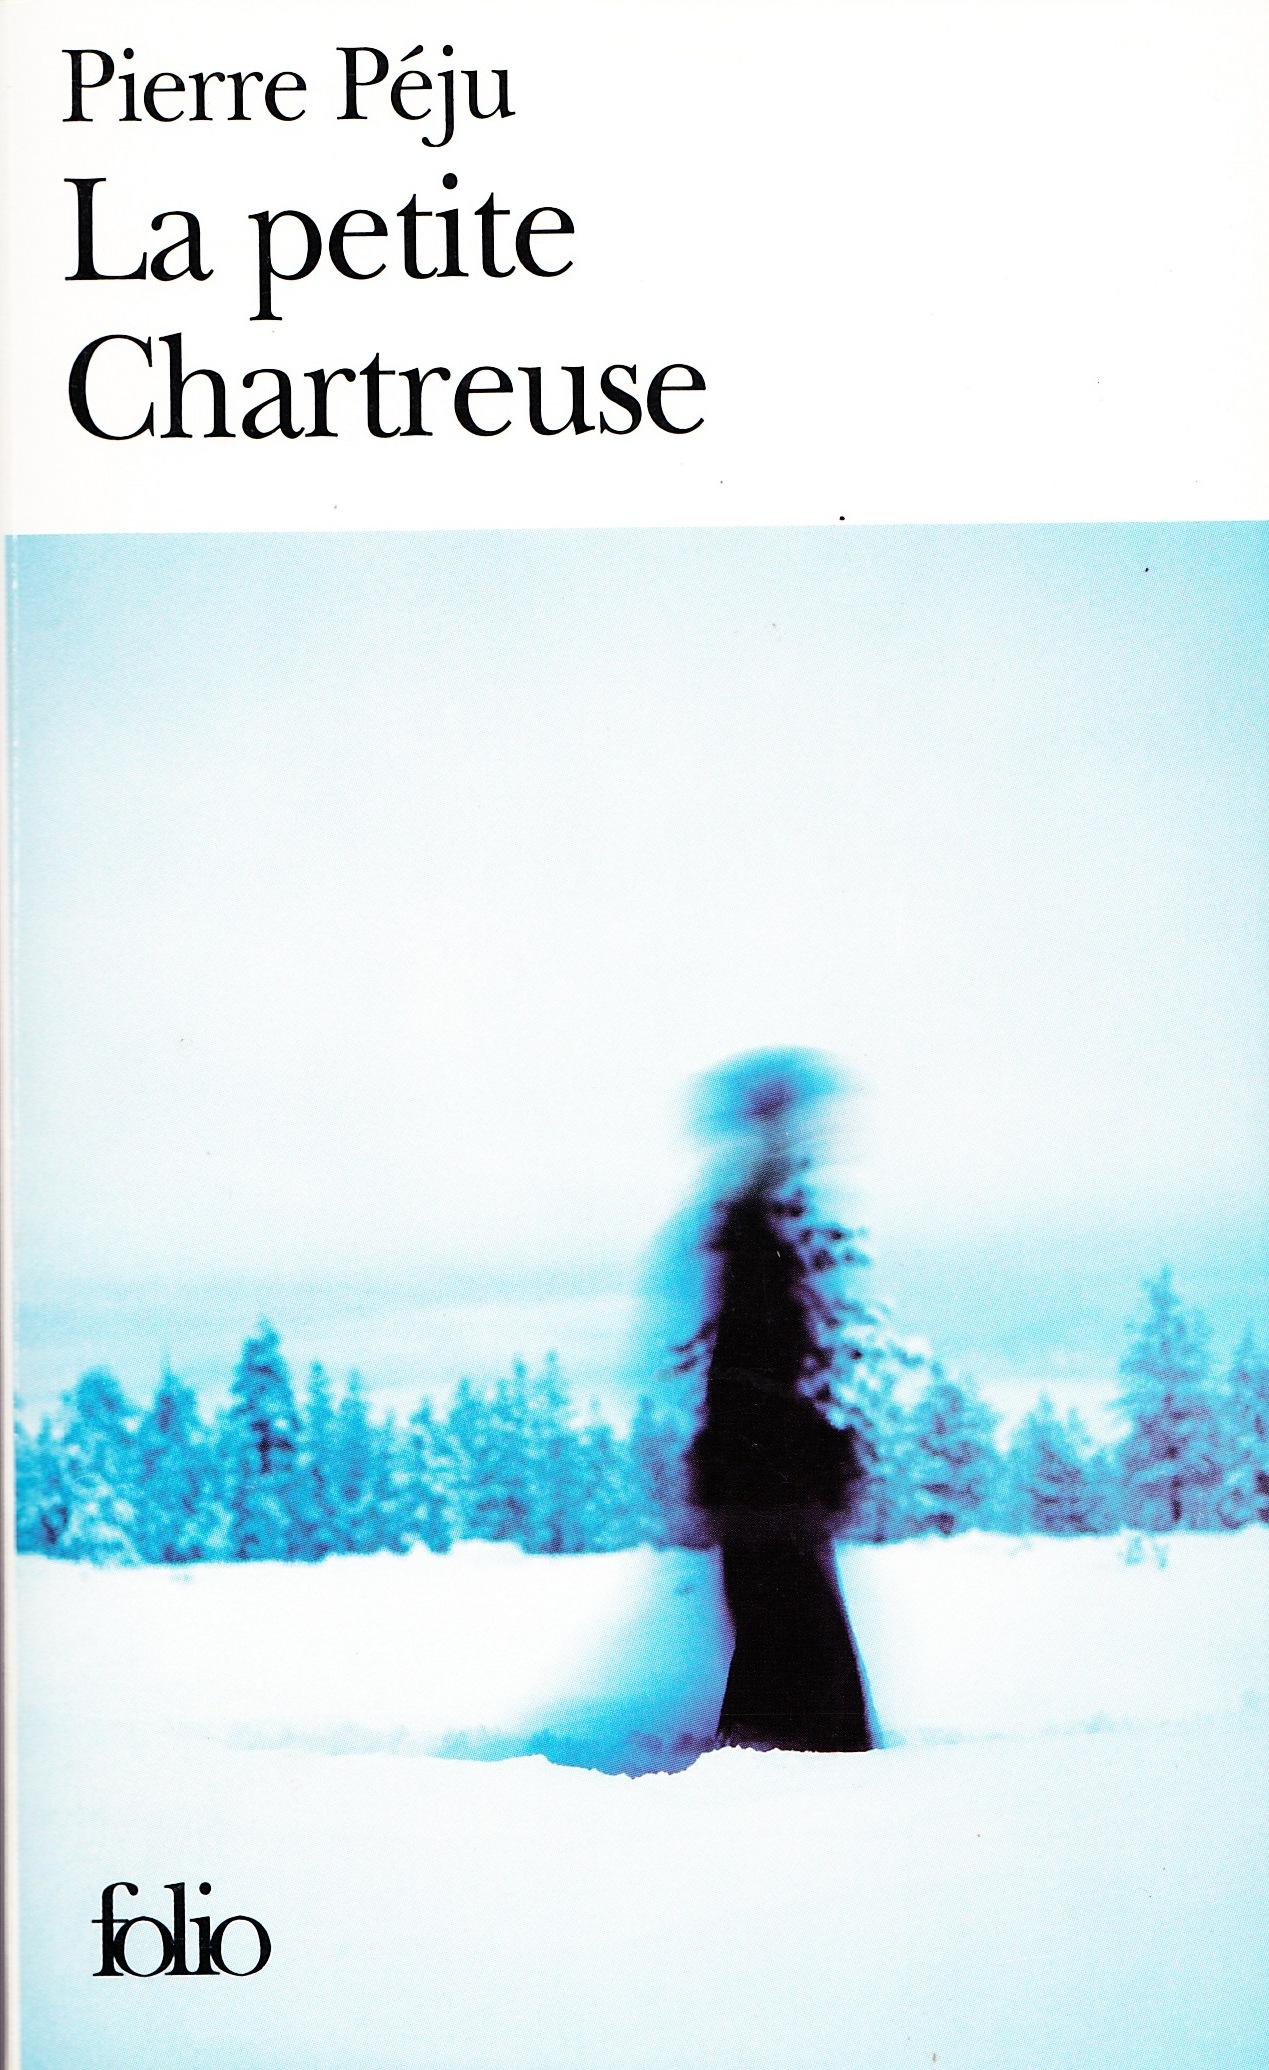 la petite chartreuse_0001